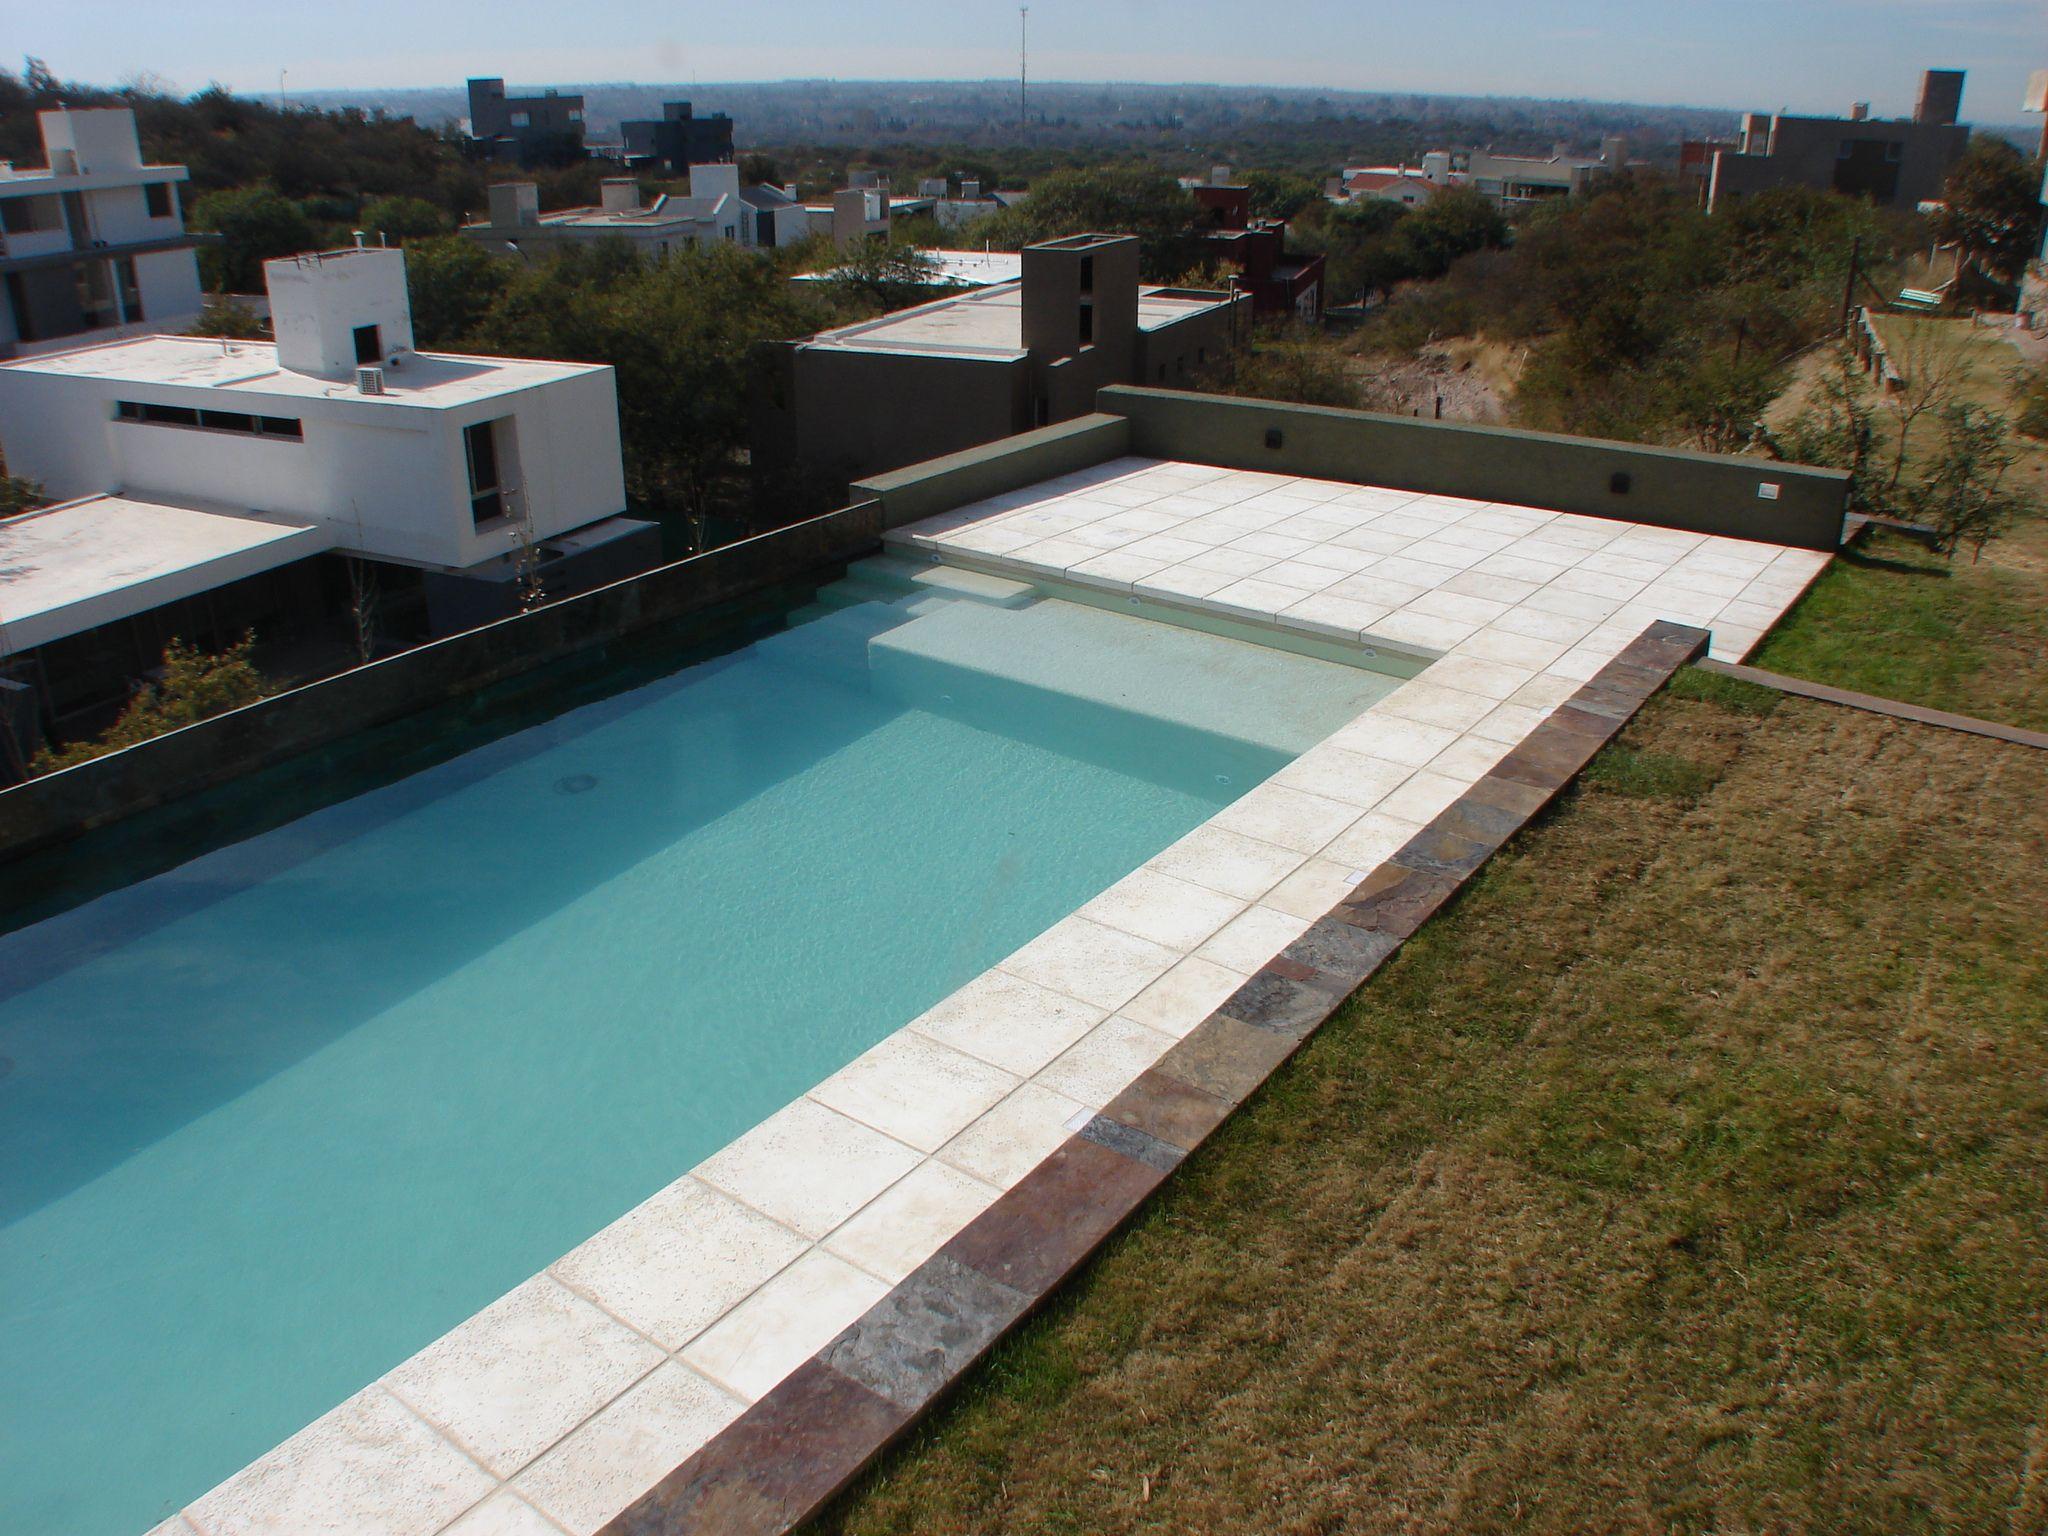 arquitectura - wellnes - diseÑo exclusivo - swimmingpool - cordoba